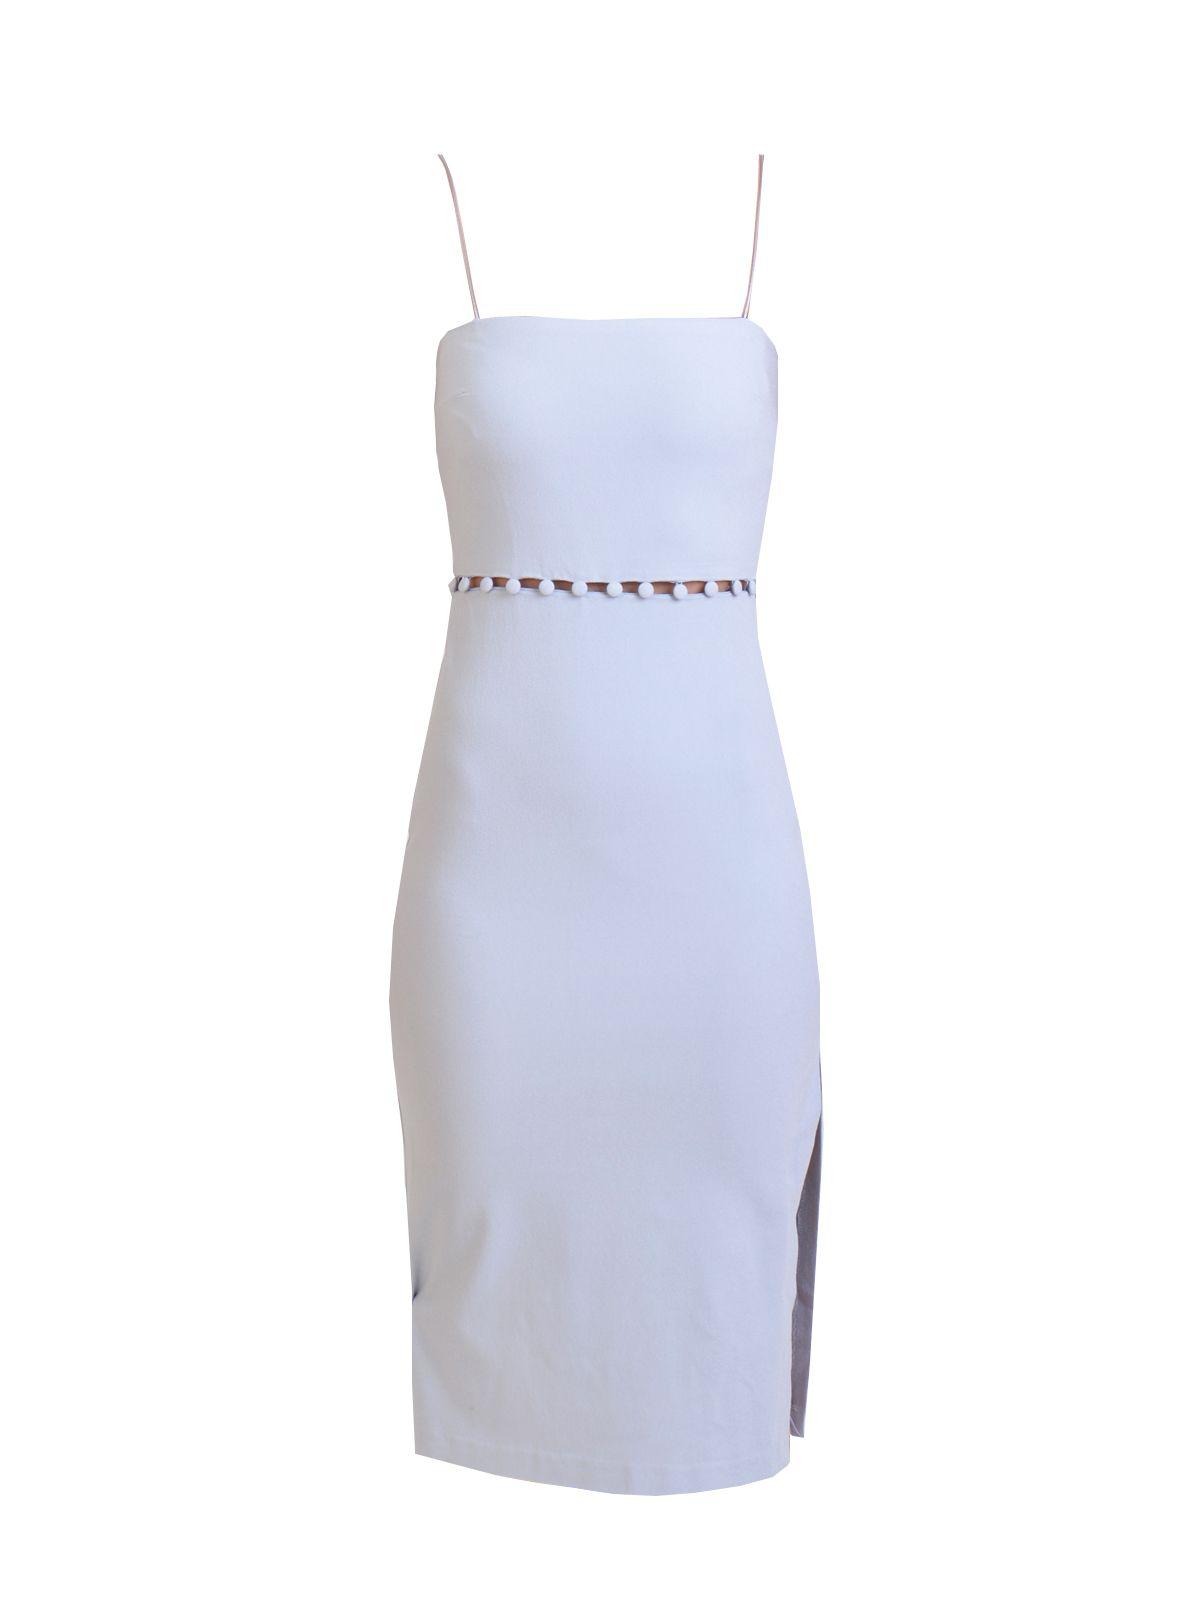 Bec bridge chrysler maxi dress